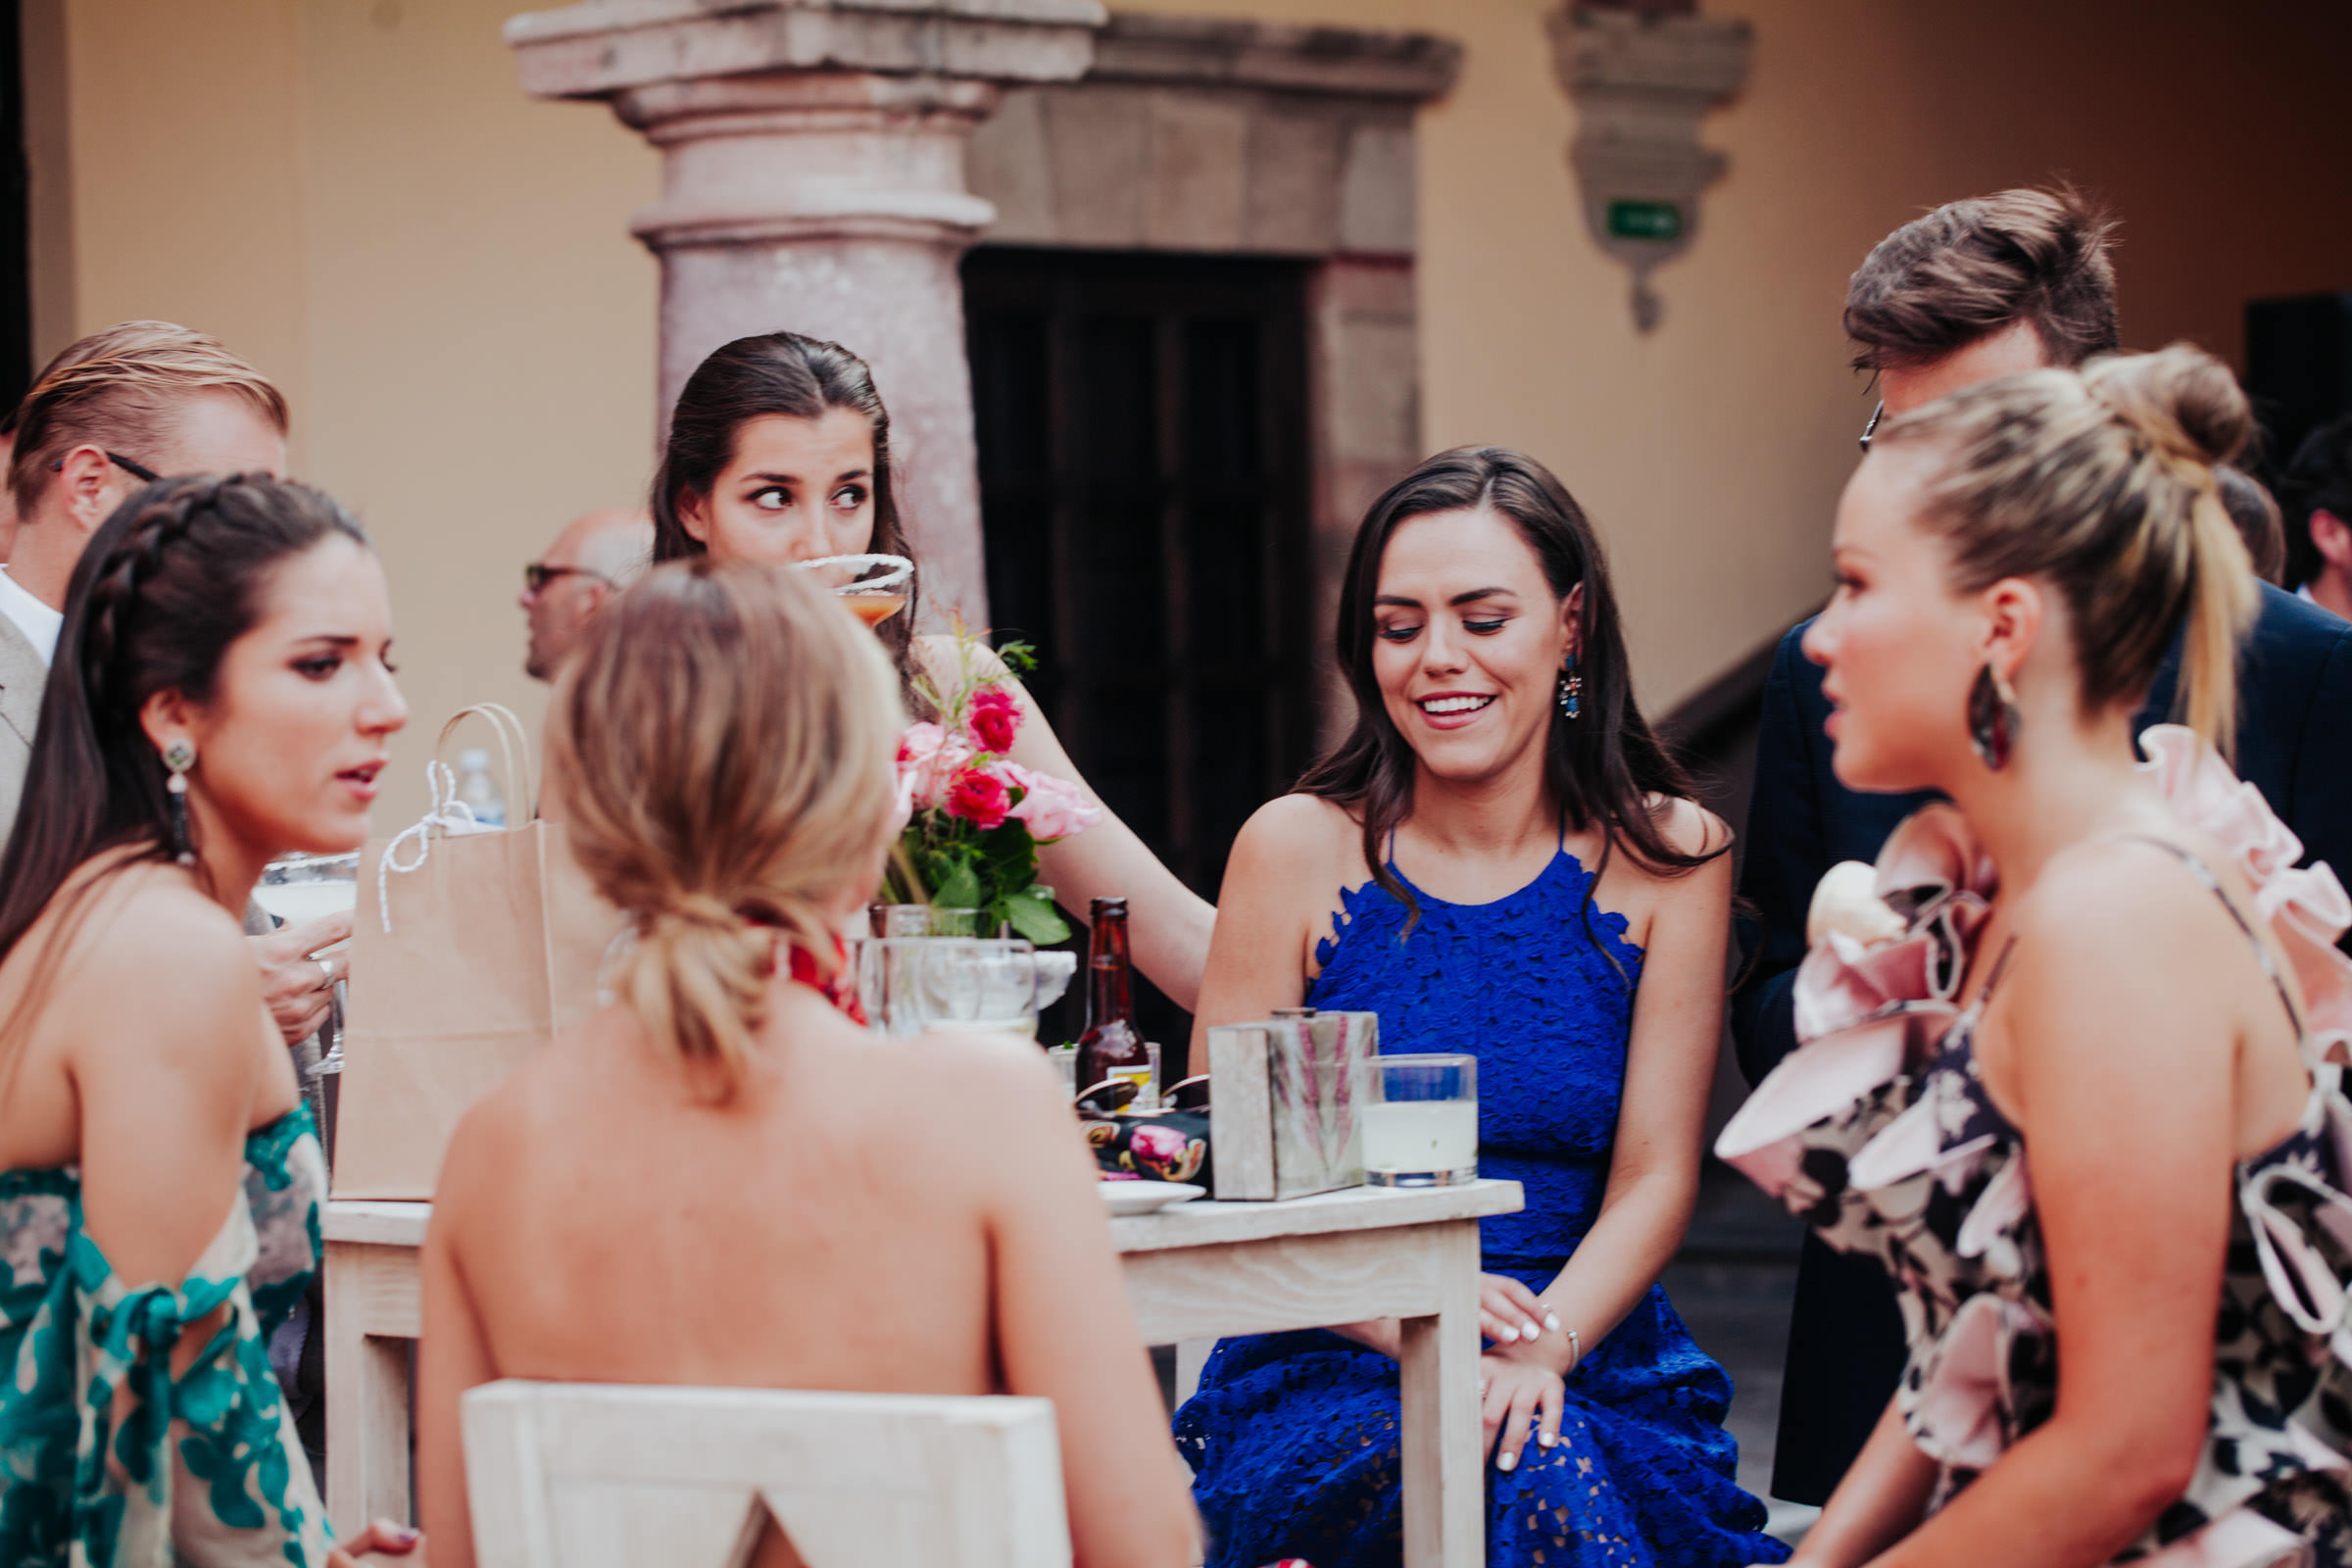 San-Miguel-de-Allende-Wedding-Photography-Parroquia-Instituto-Boda-Fotografia-Fer-Sergio-Pierce-Lifestyle-Photography0004.JPG